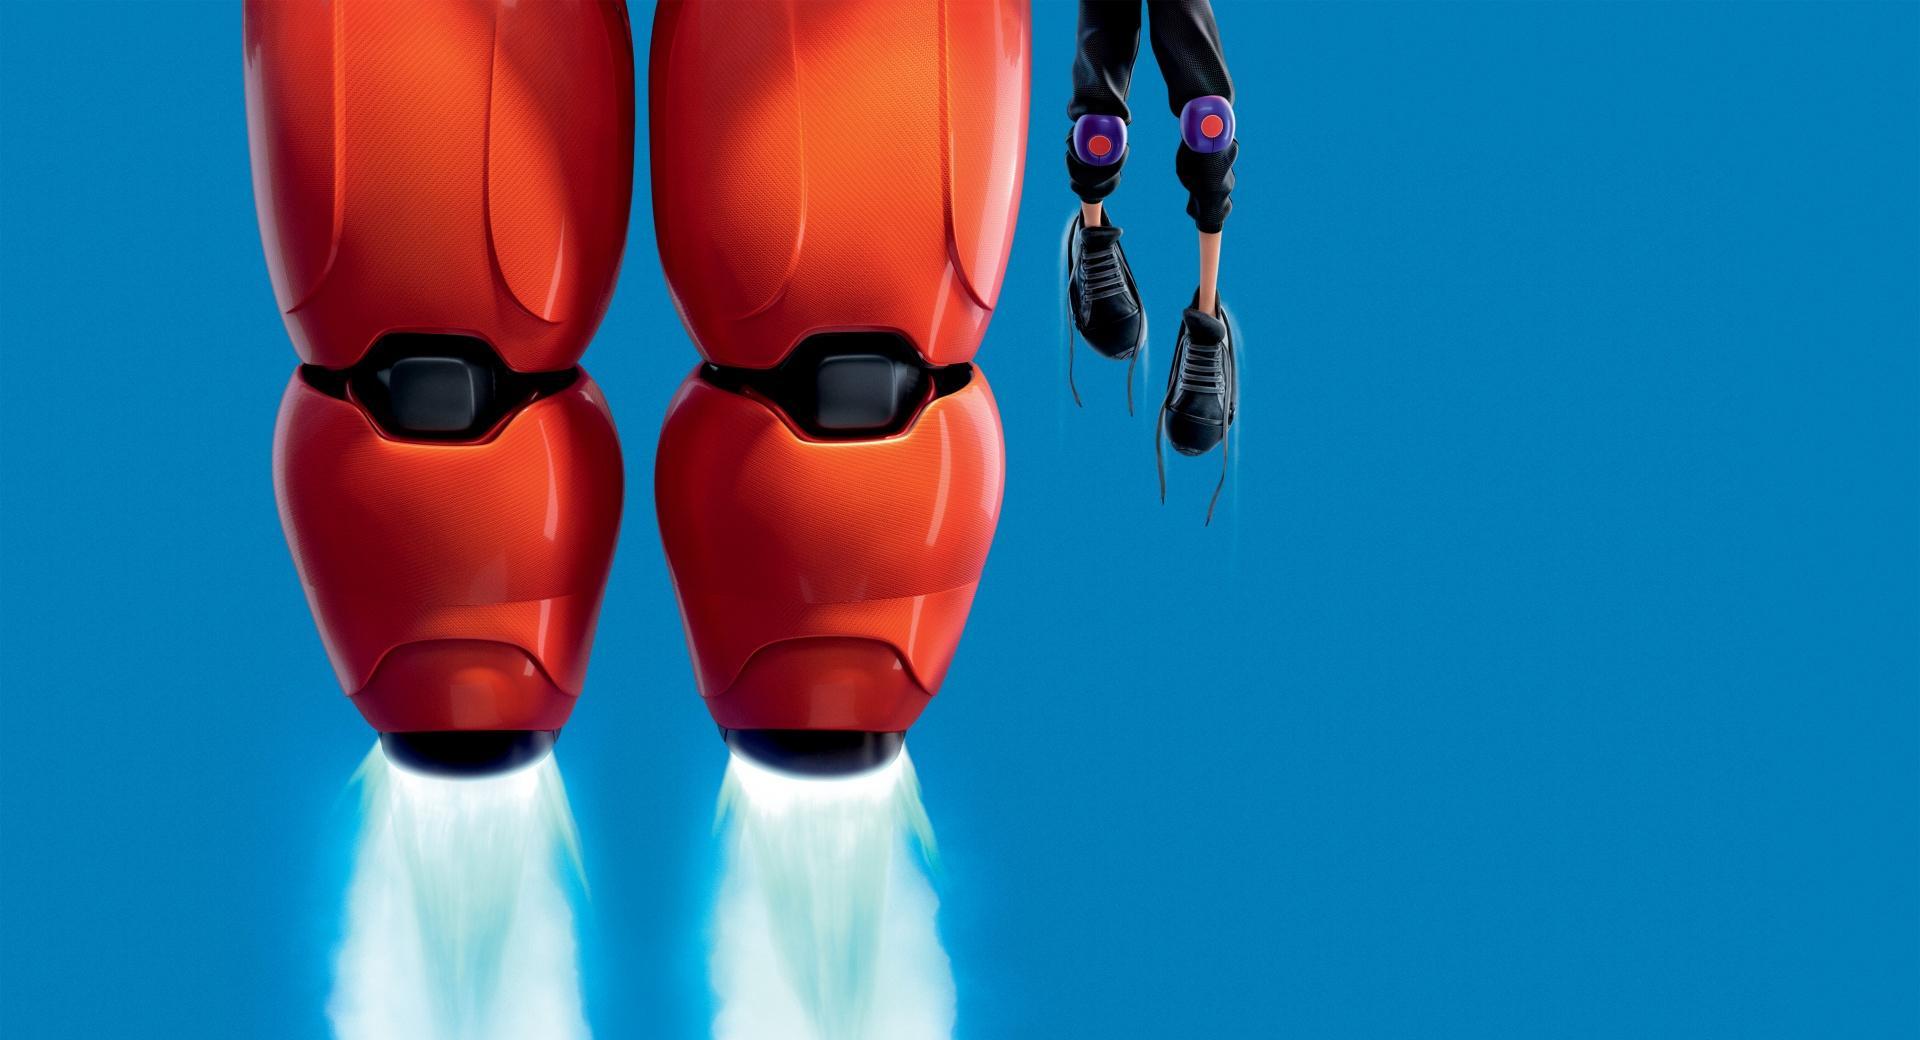 BIG HERO 6 2014 Film wallpapers HD quality